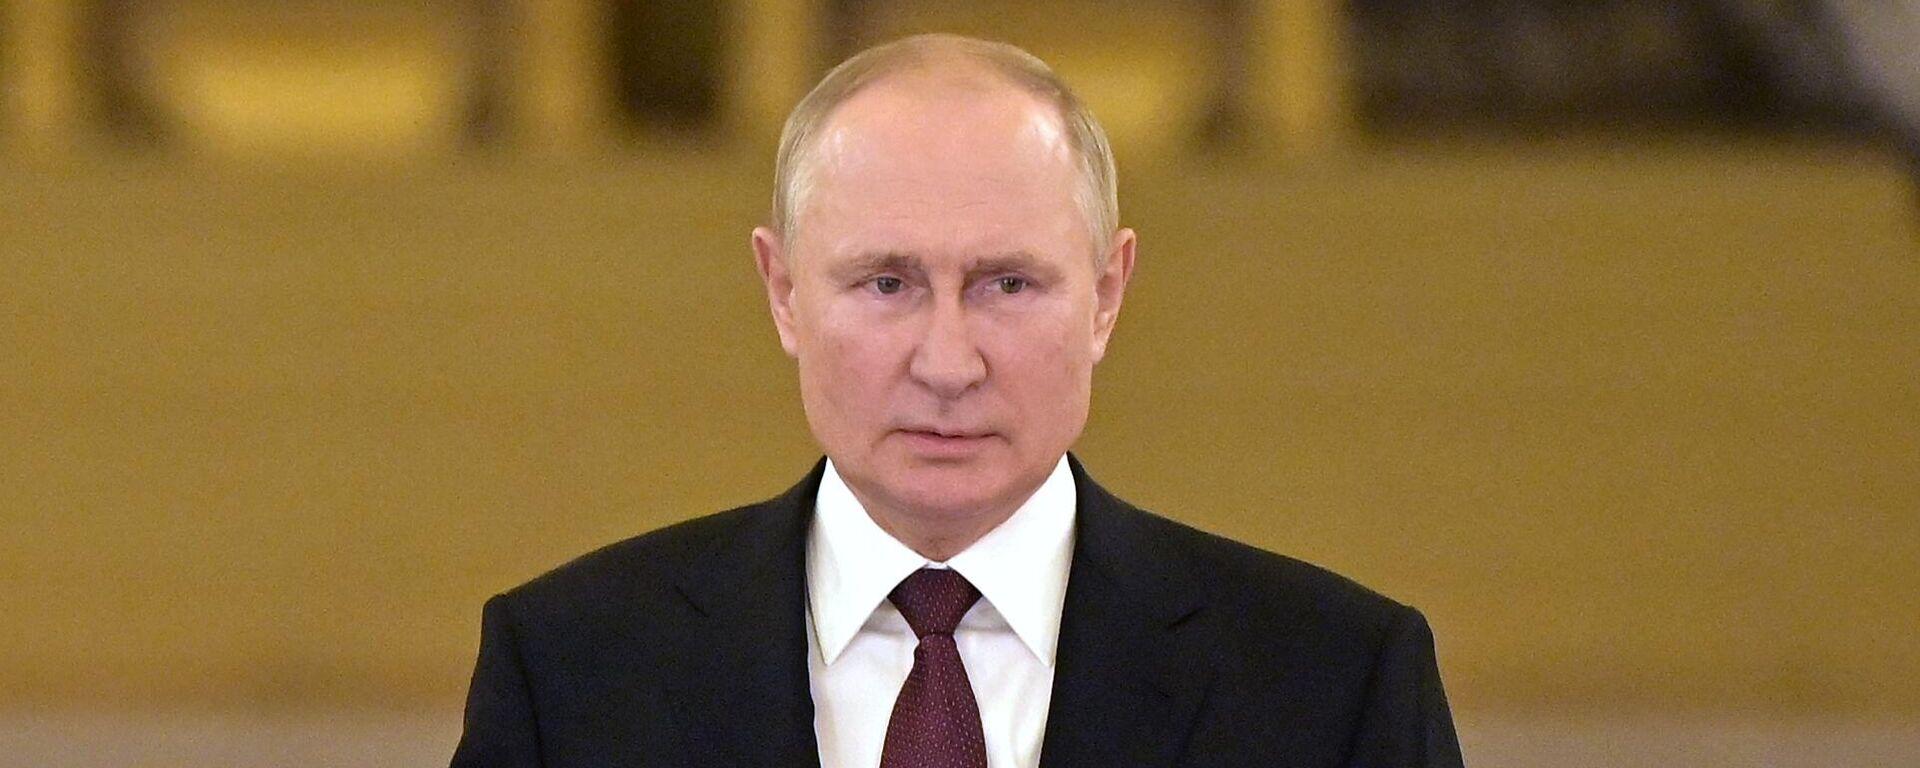 Президент РФ Владимир Путин - Sputnik Тоҷикистон, 1920, 25.08.2021